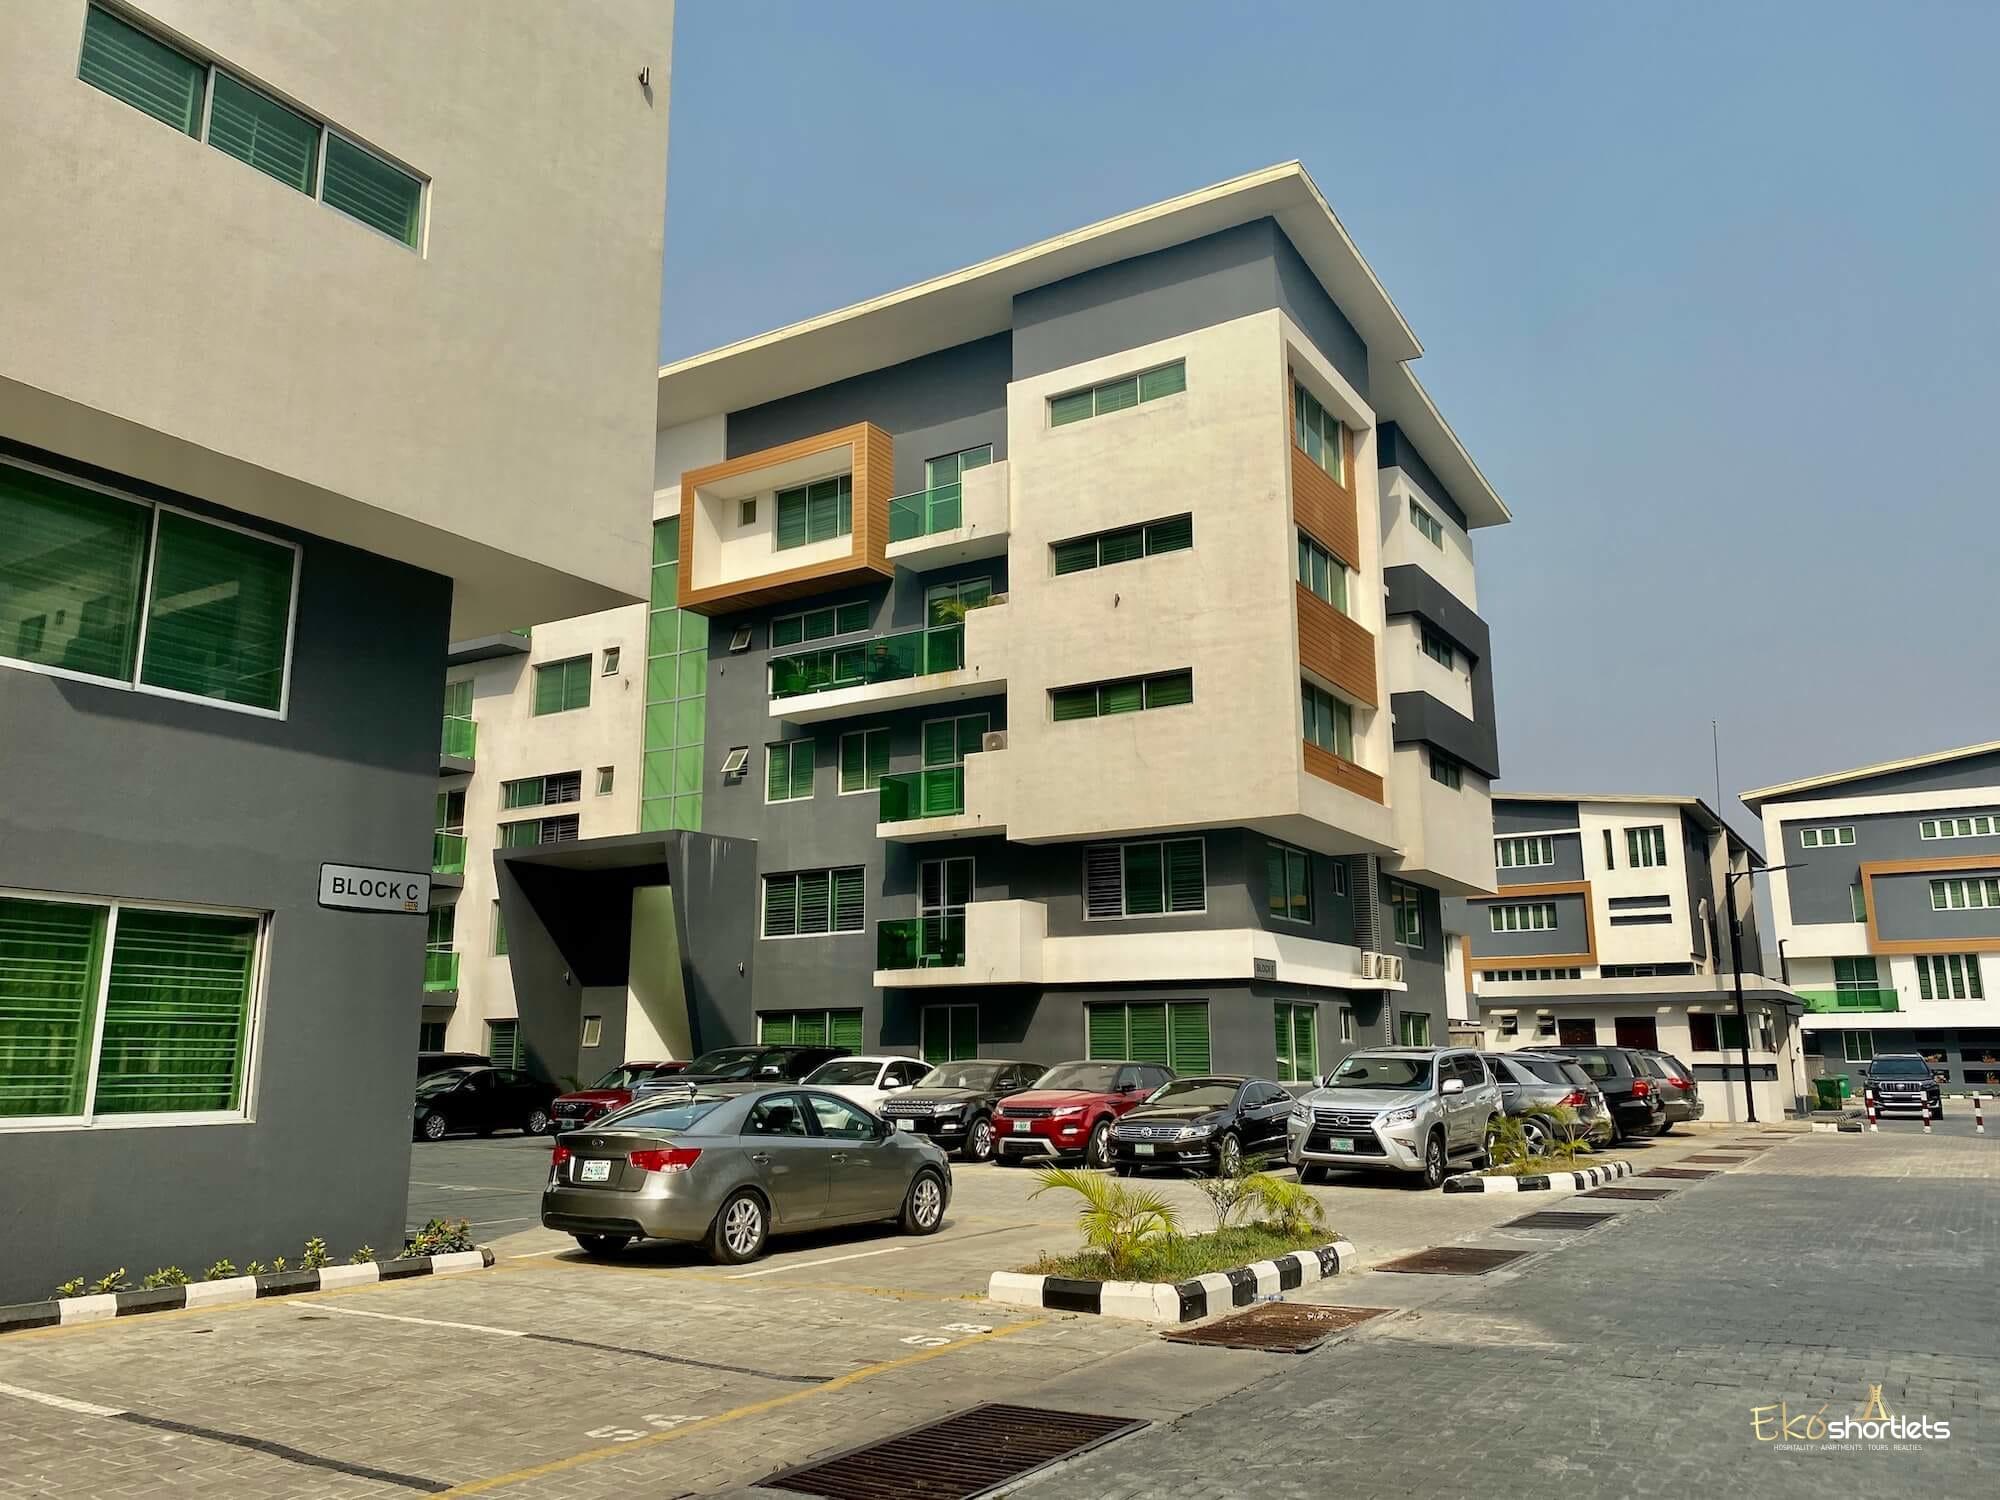 3 Bedroom Richmond Gate - Dapo